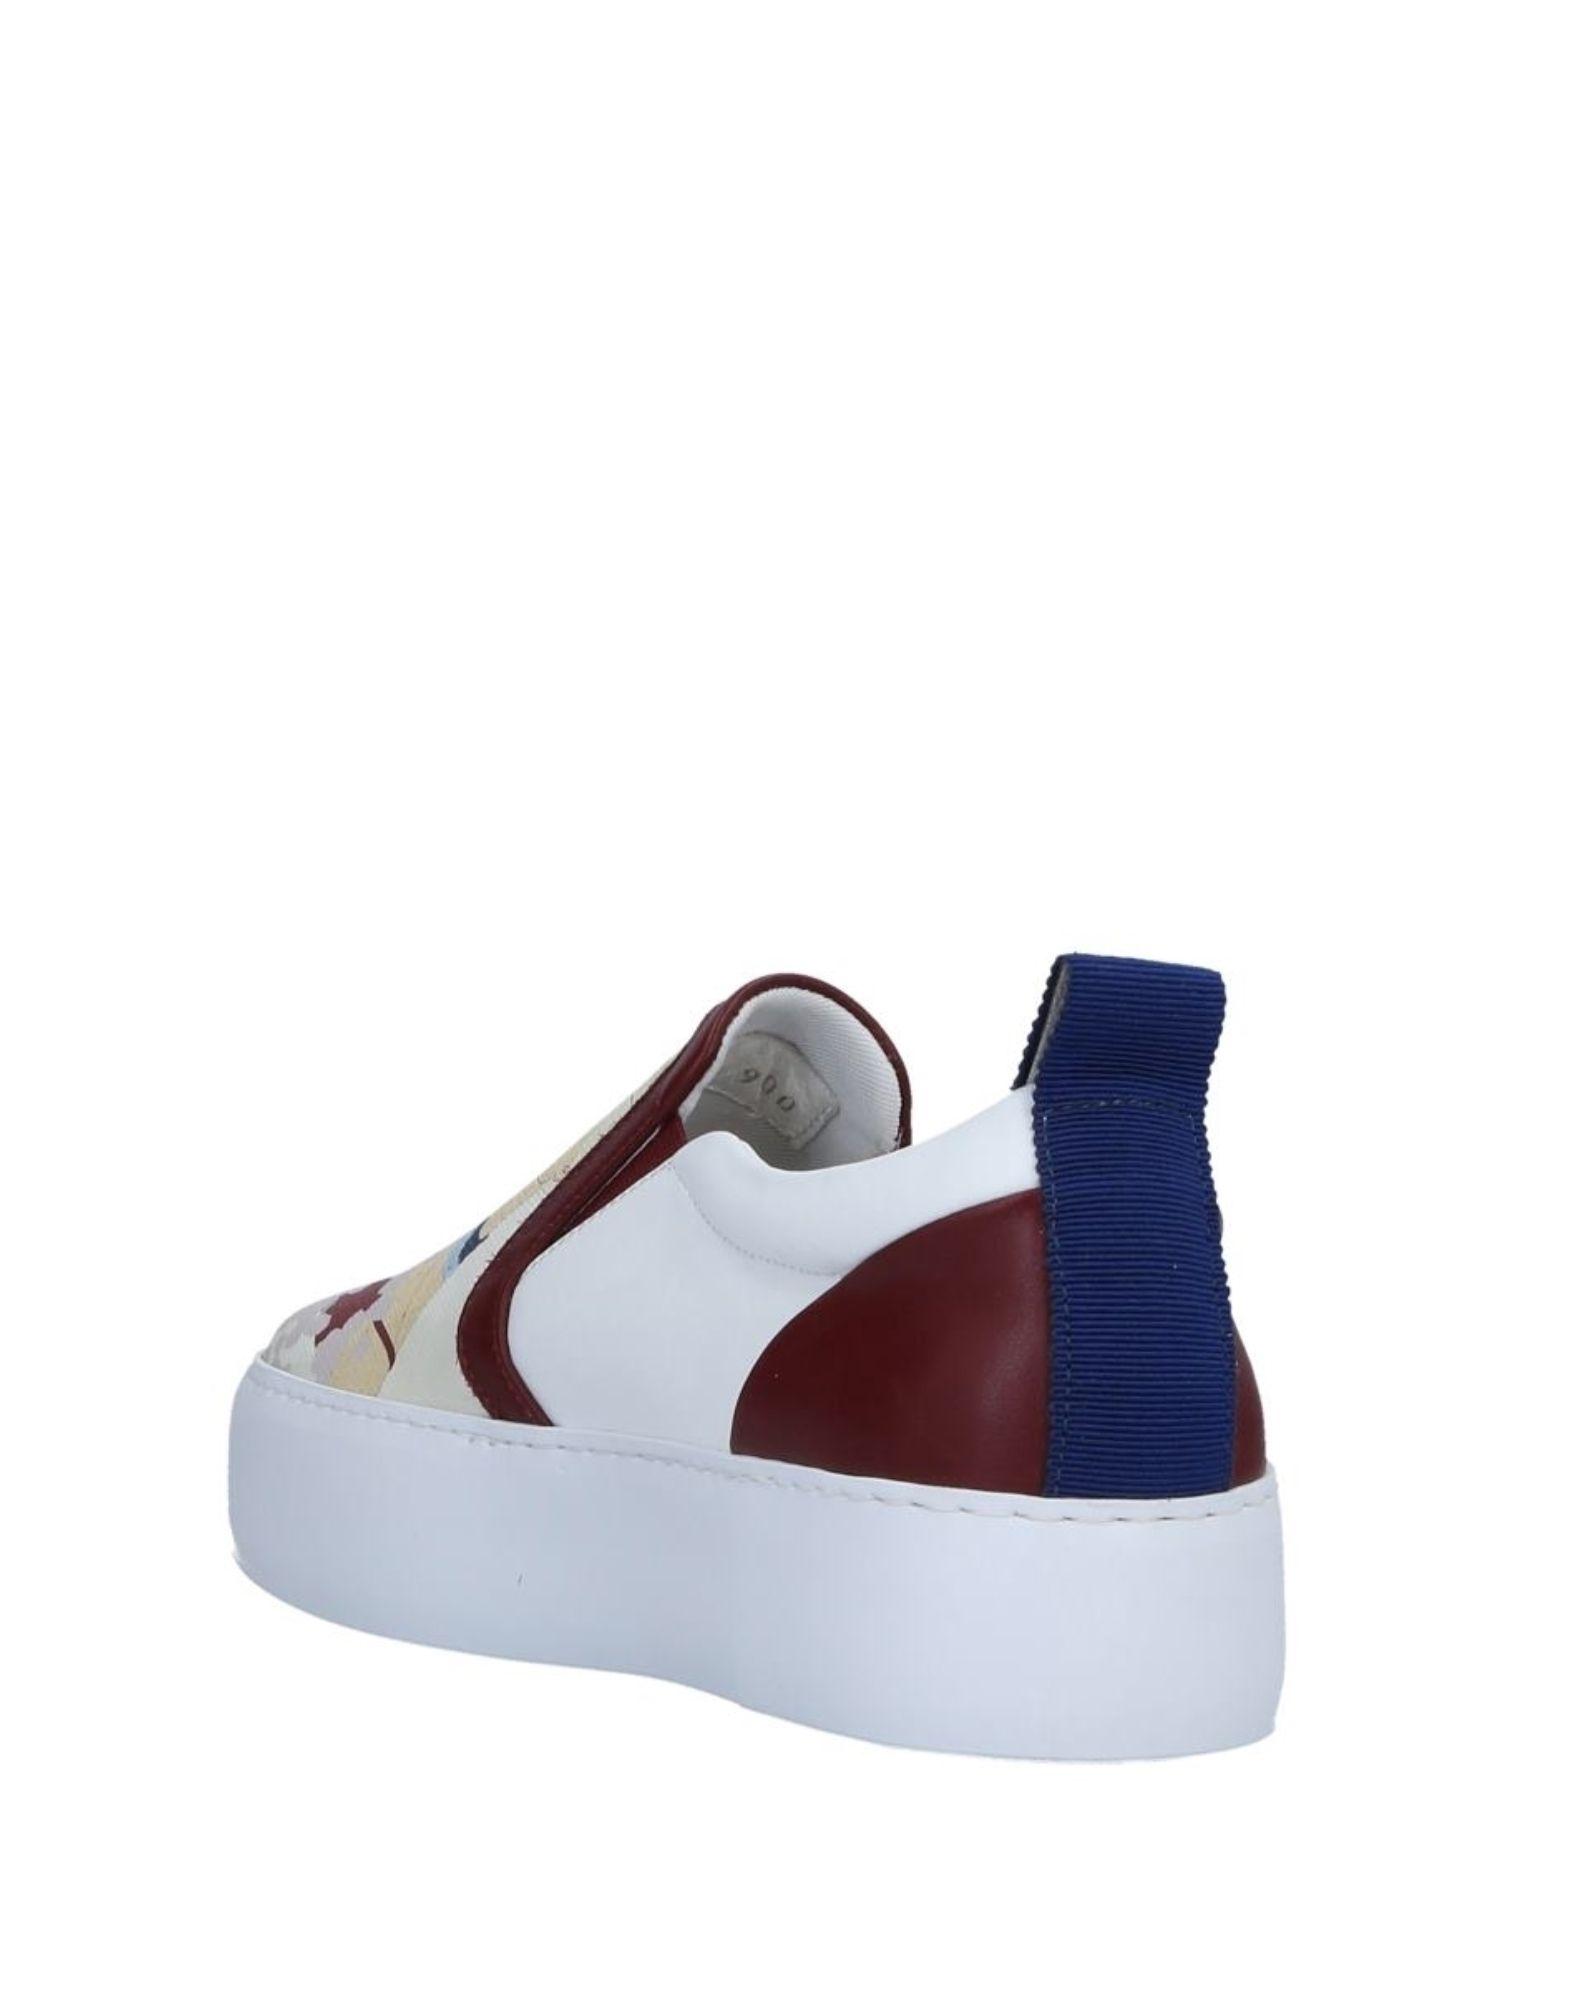 Stilvolle Trend billige Schuhe Baldinini Trend Stilvolle Sneakers Damen  11538982CH f6e0f6